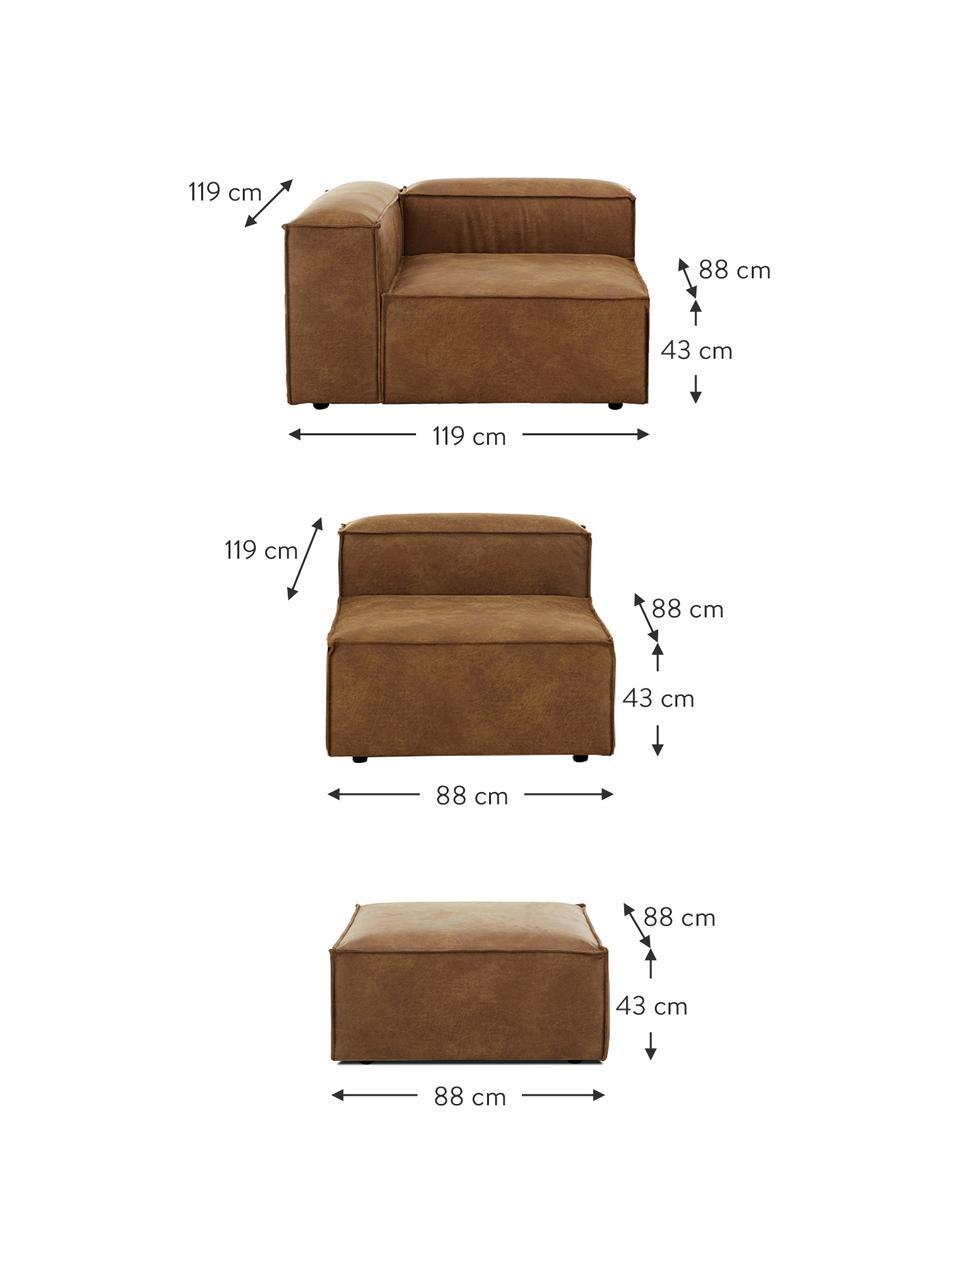 Modulares Sofa Lennon (4-Sitzer) mit Hocker in Braun aus recyceltem Leder, Bezug: Recyceltes Leder (70% Led, Gestell: Massives Kiefernholz, Spe, Füße: Kunststoff Die Füße befin, Leder Braun, B 327 x T 207 cm